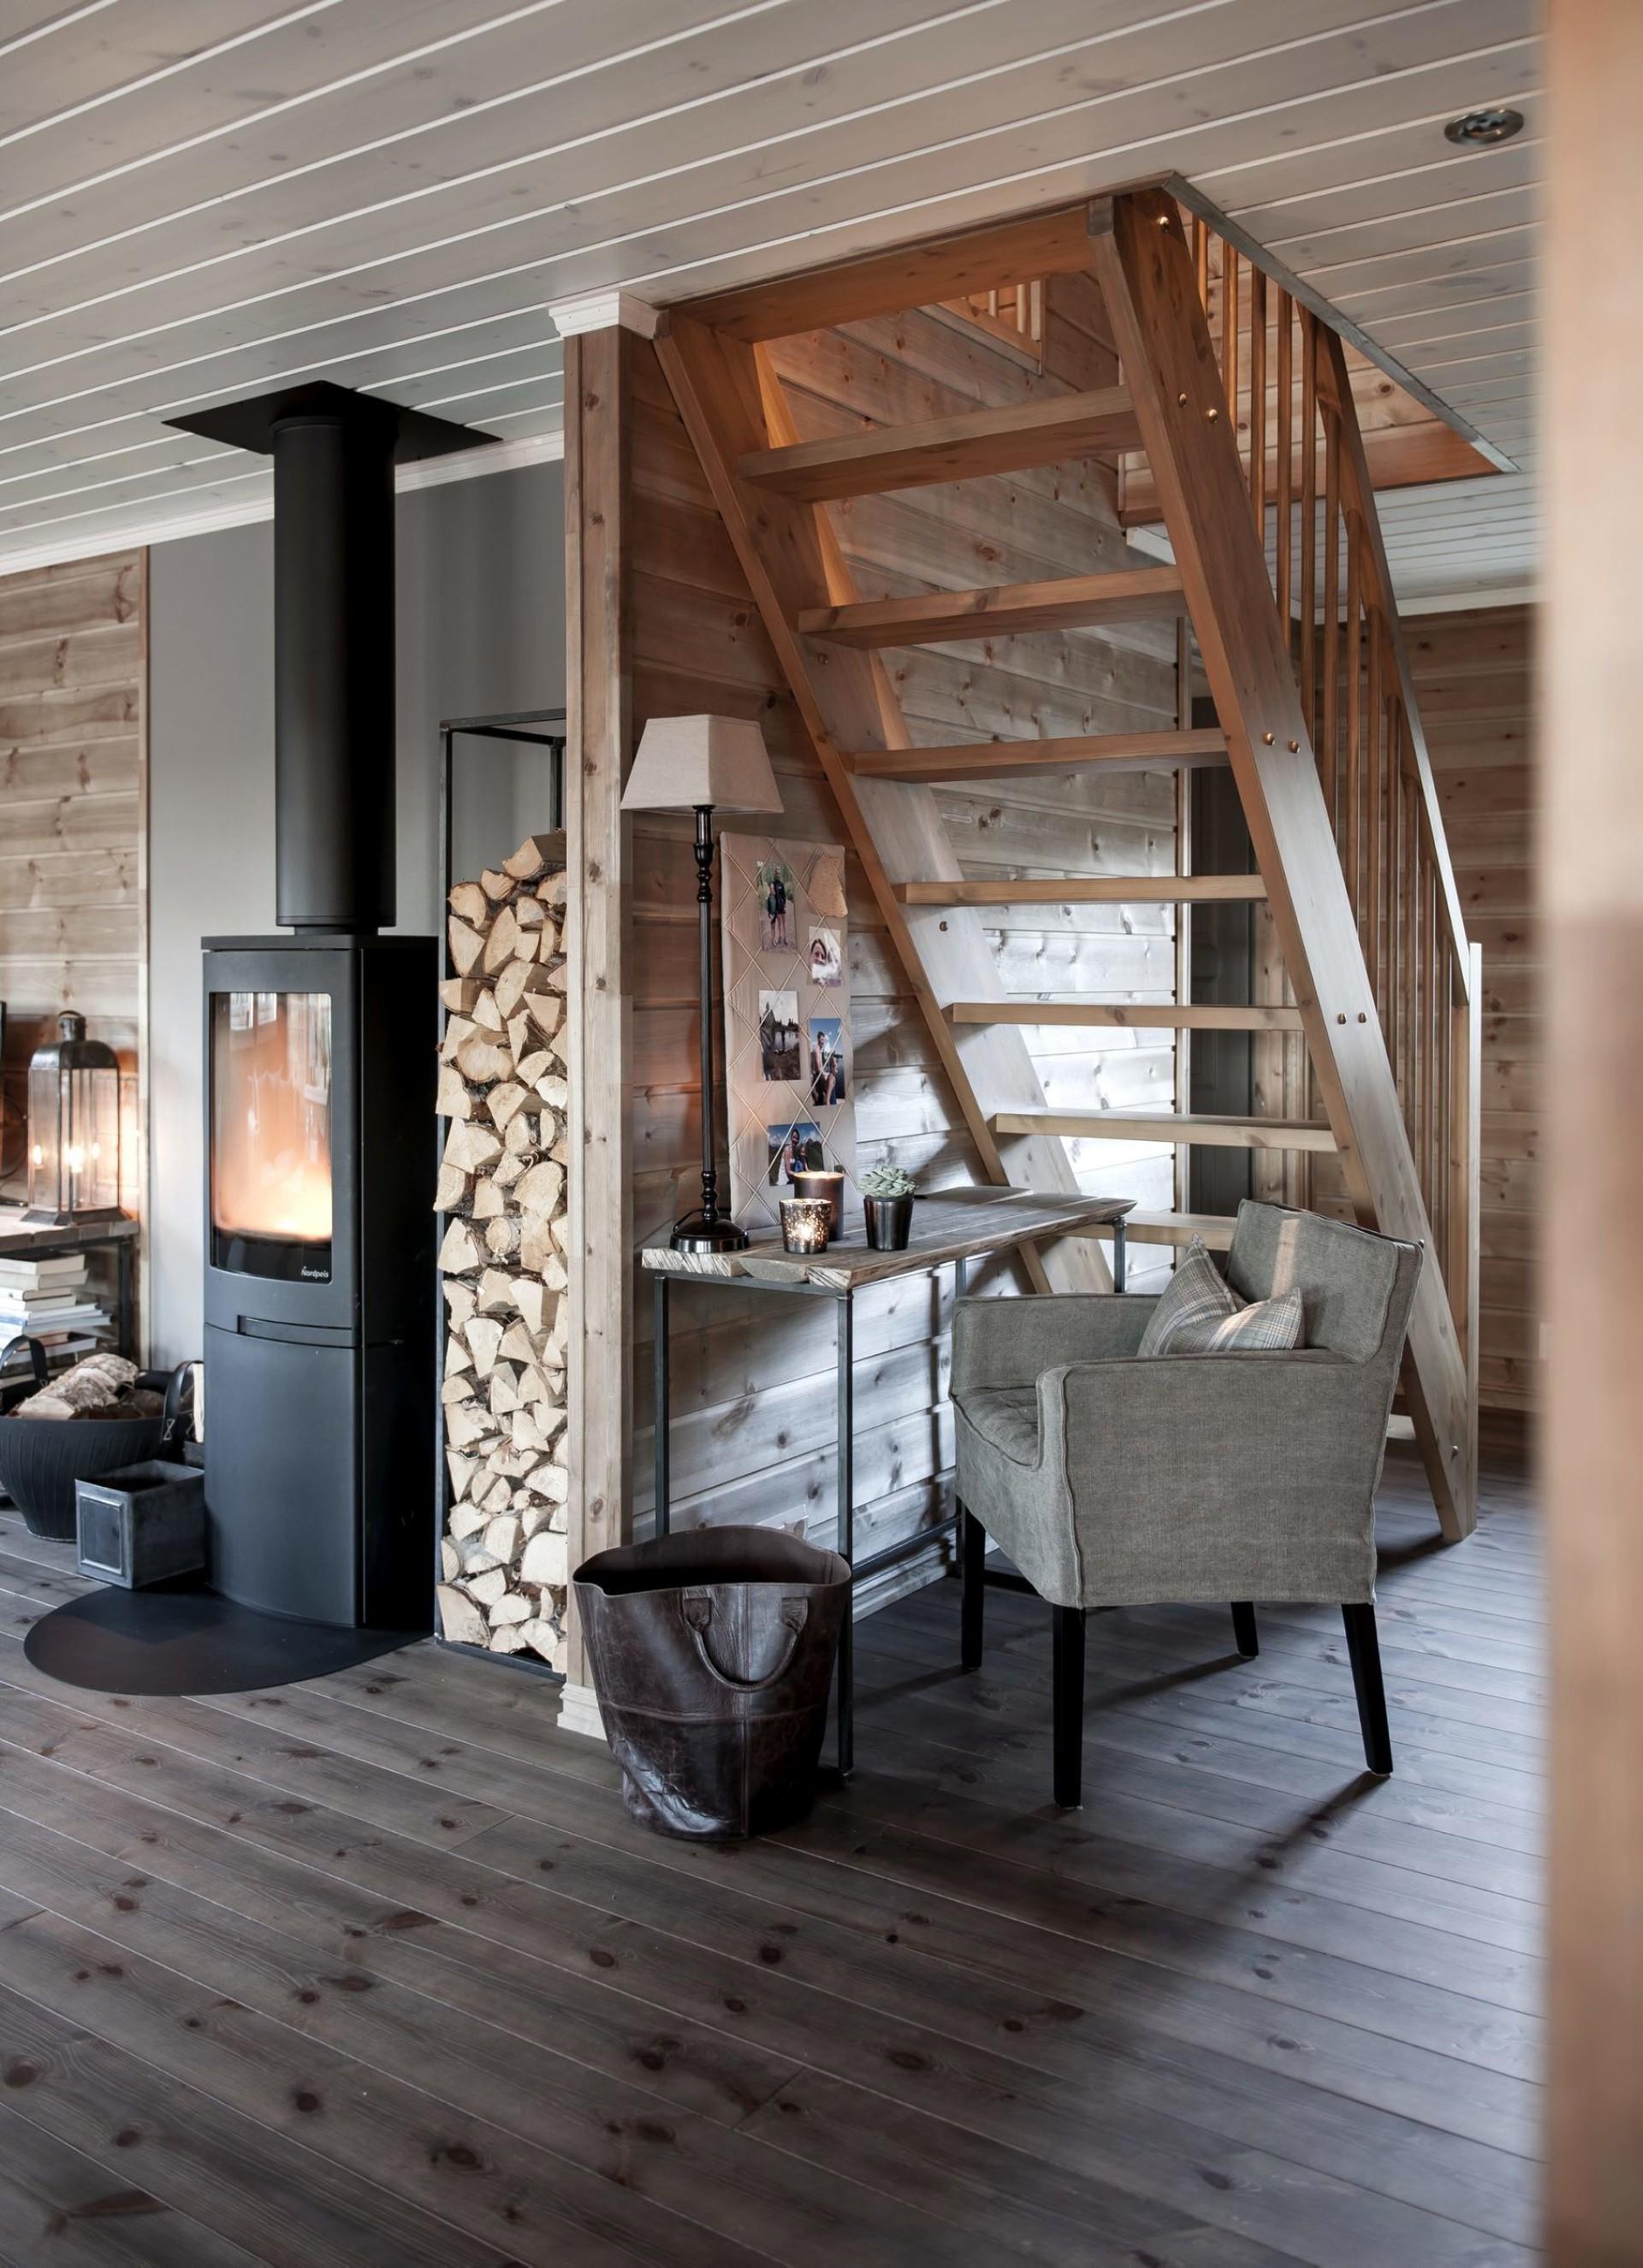 дровяная печь дрова лестница коридор